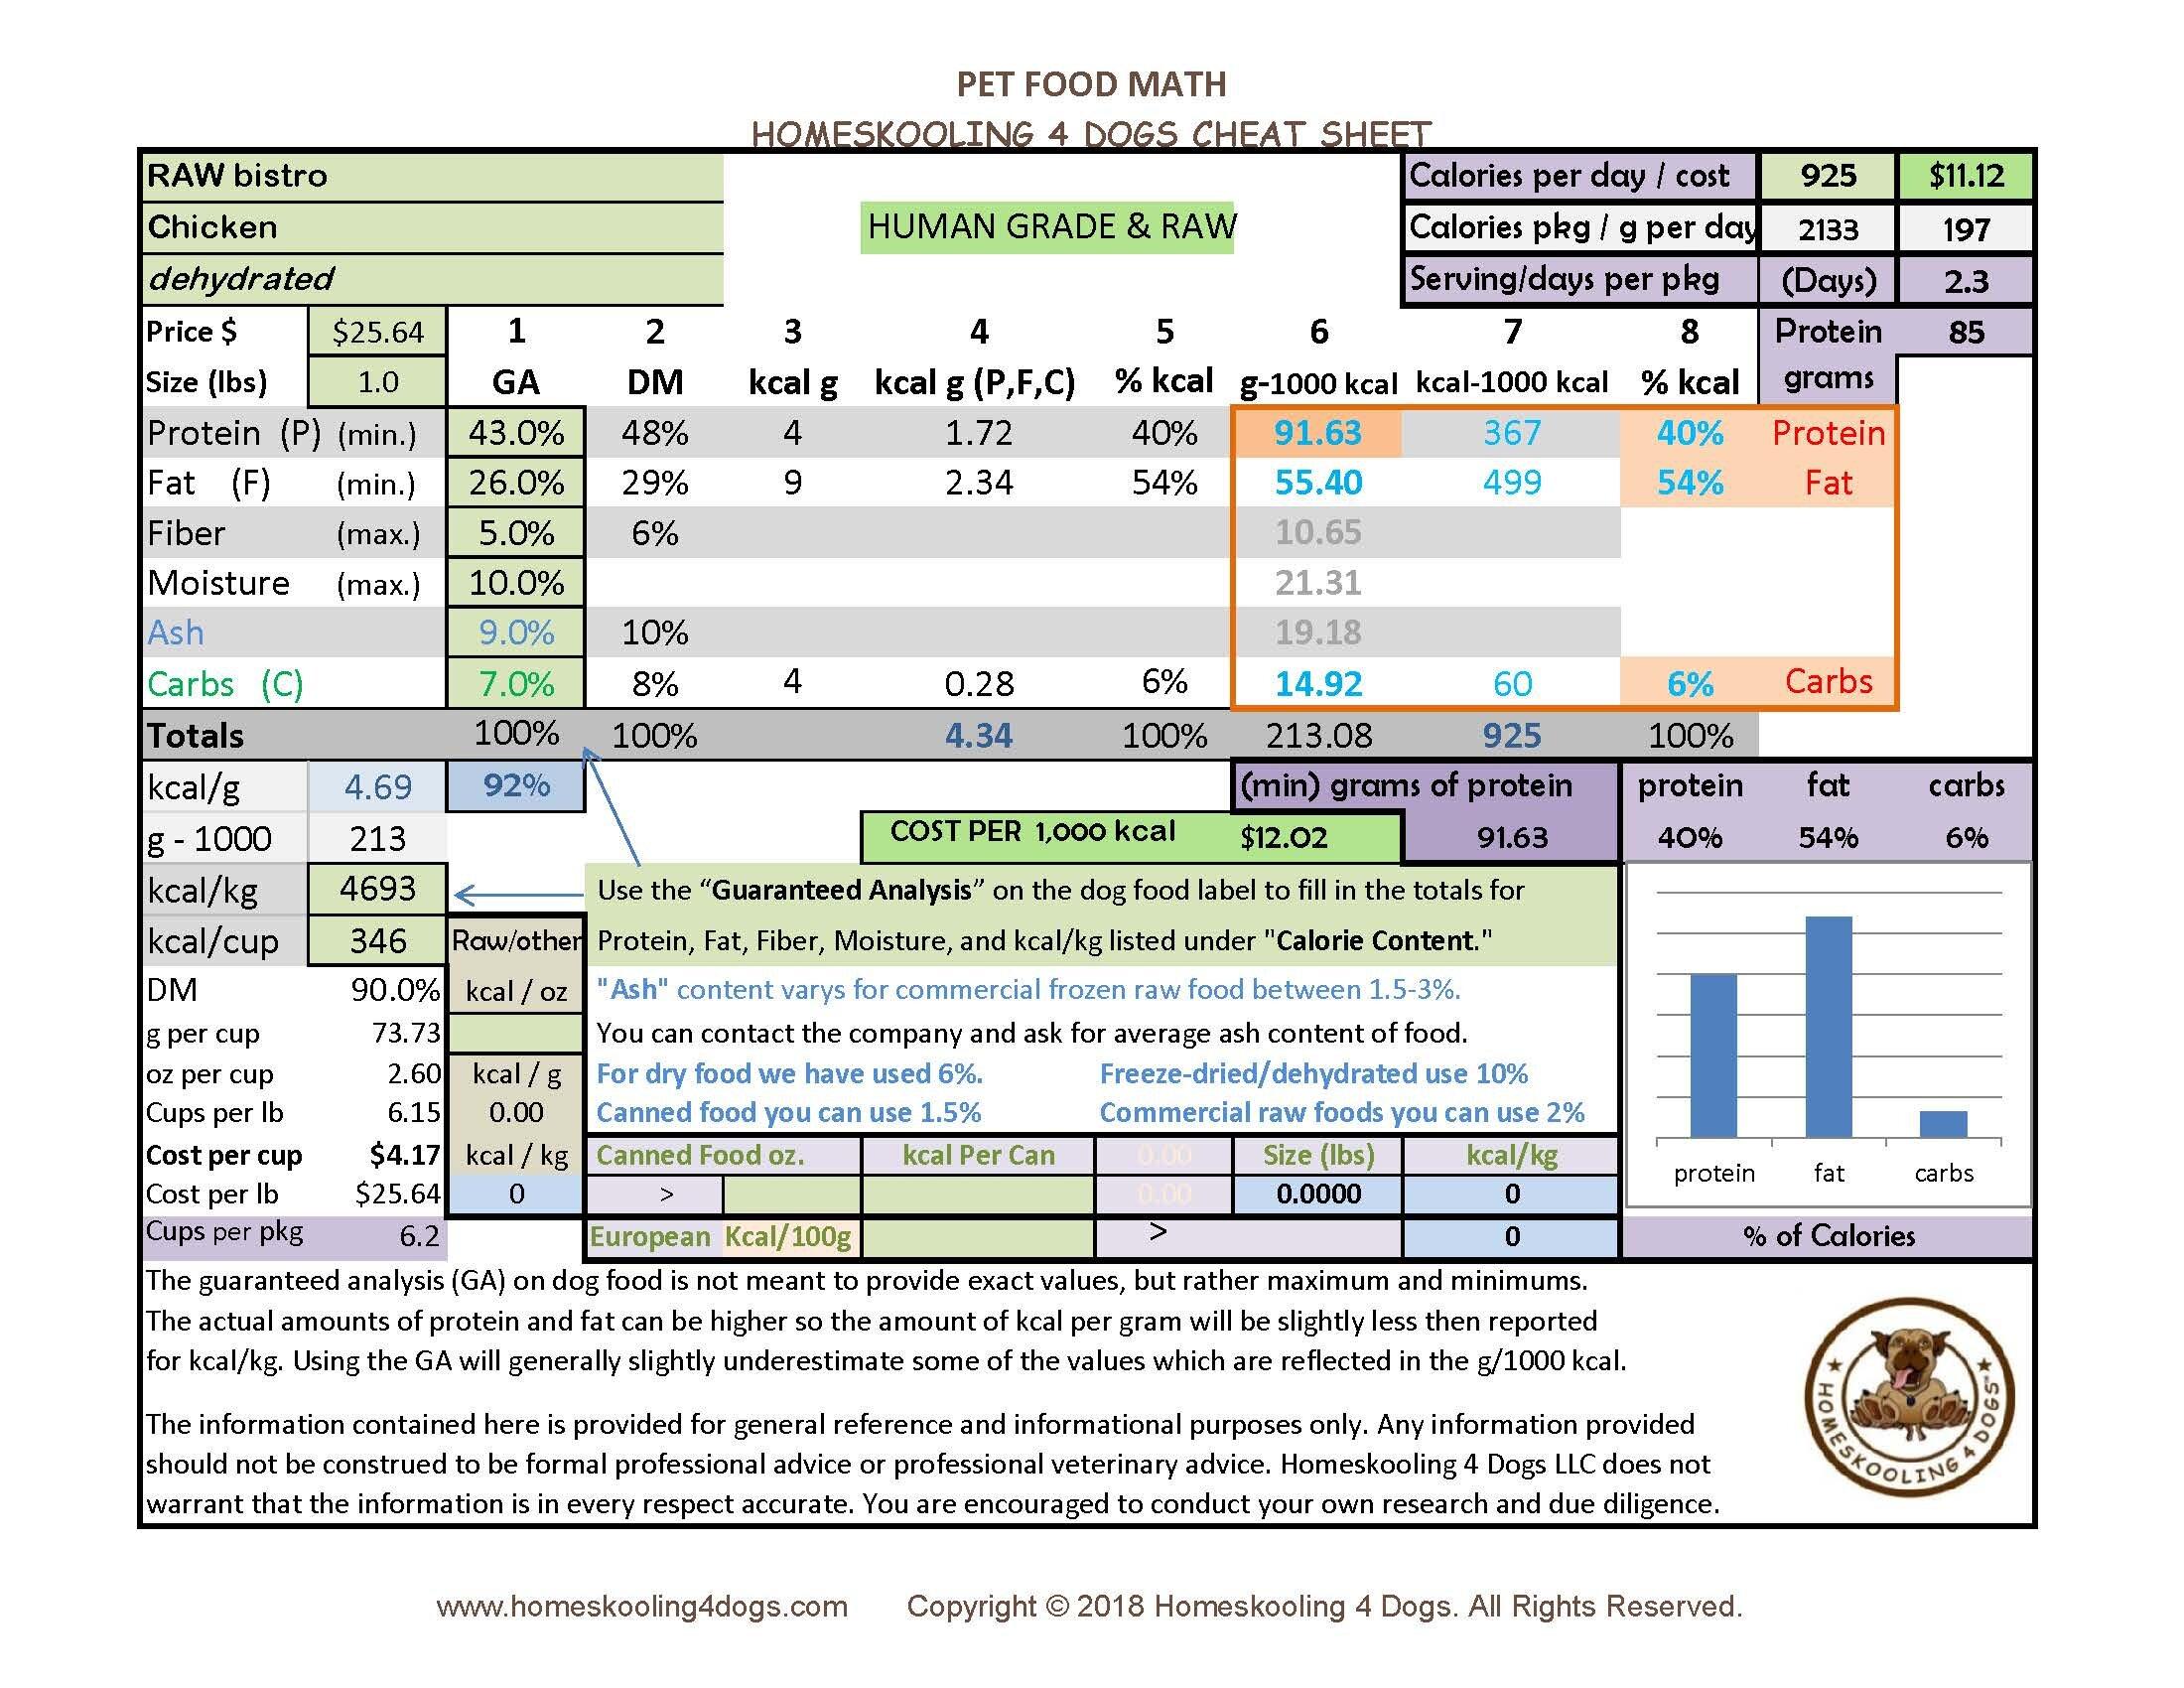 RAW bistro chick dehydrated Pet Food Math Cheat Sheet.jpg